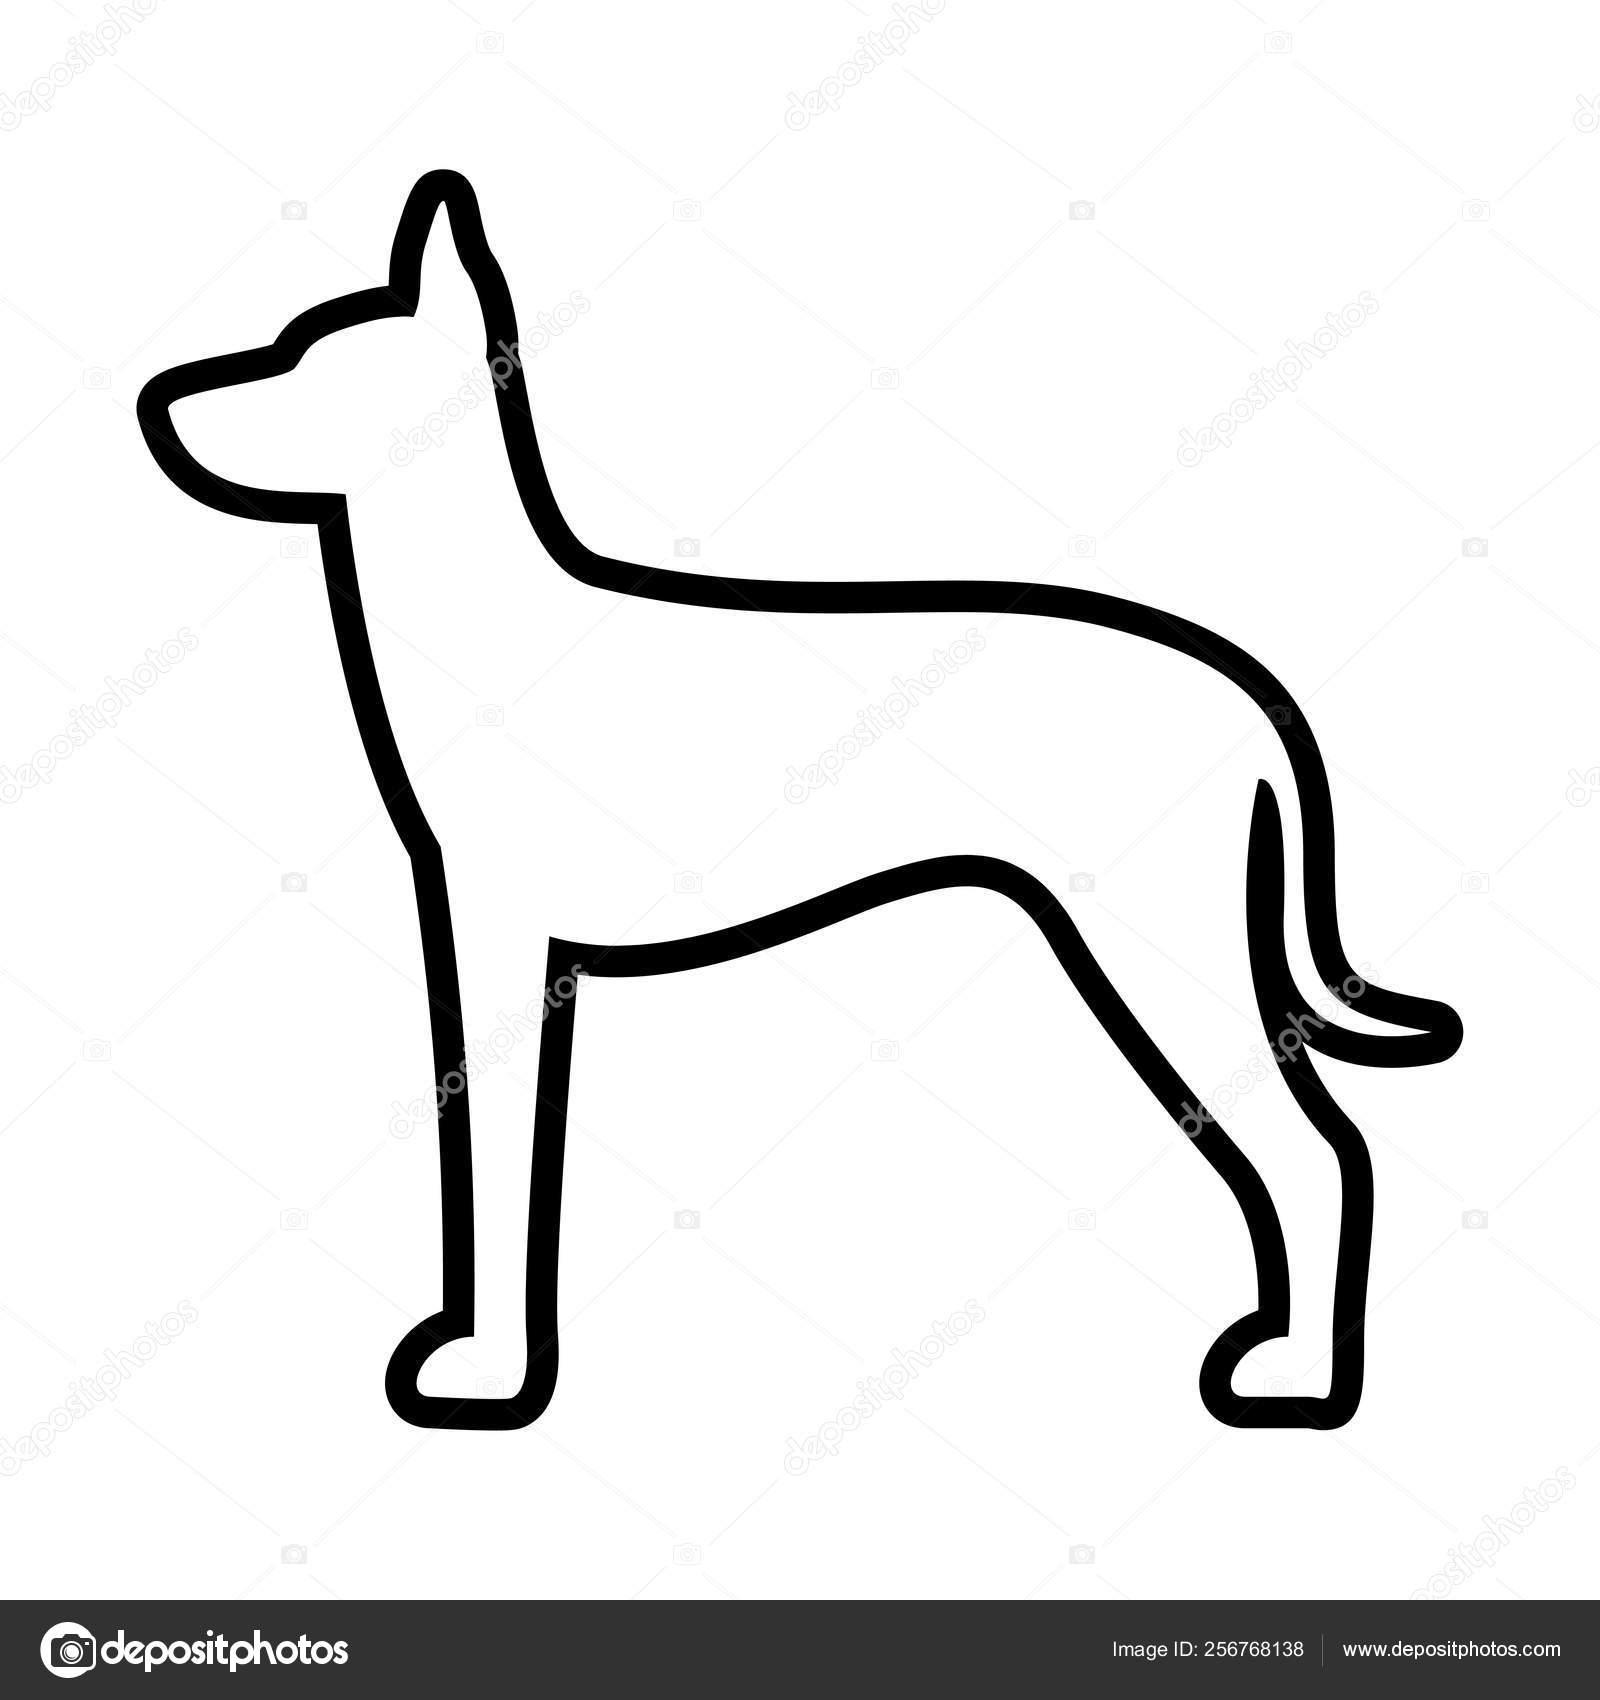 Xoloitzcuintli Icono De Perro Aislado Sobre Fondo Blanco